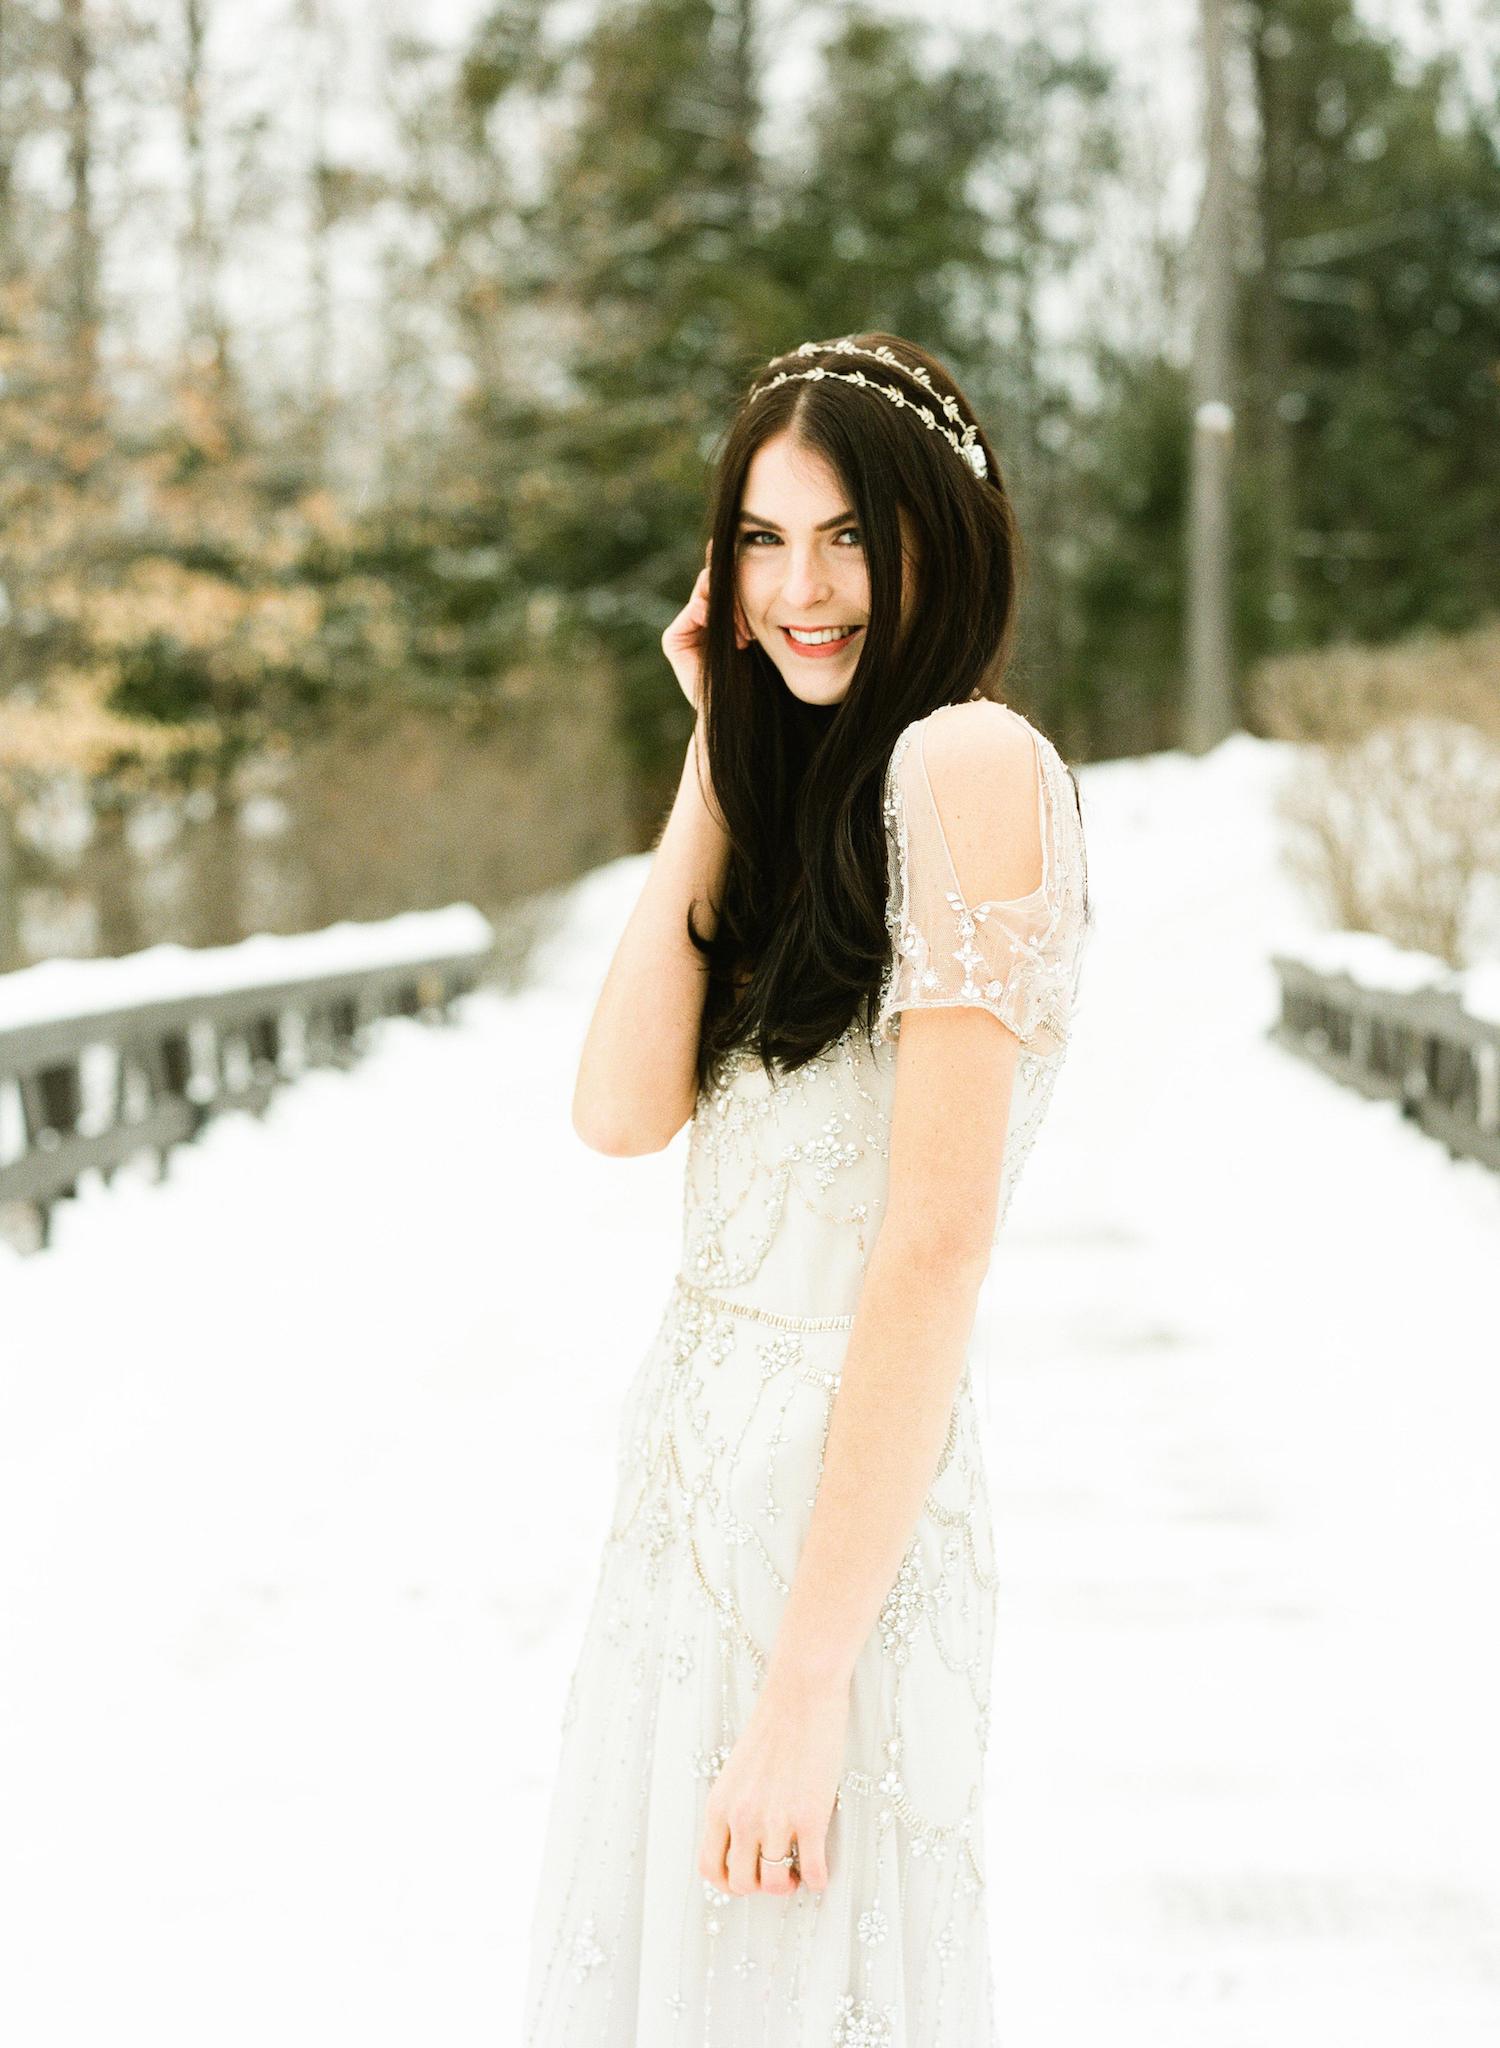 Winter Editorial-JennyPackham-LindsayMaddenPhotography-28 copy.jpg